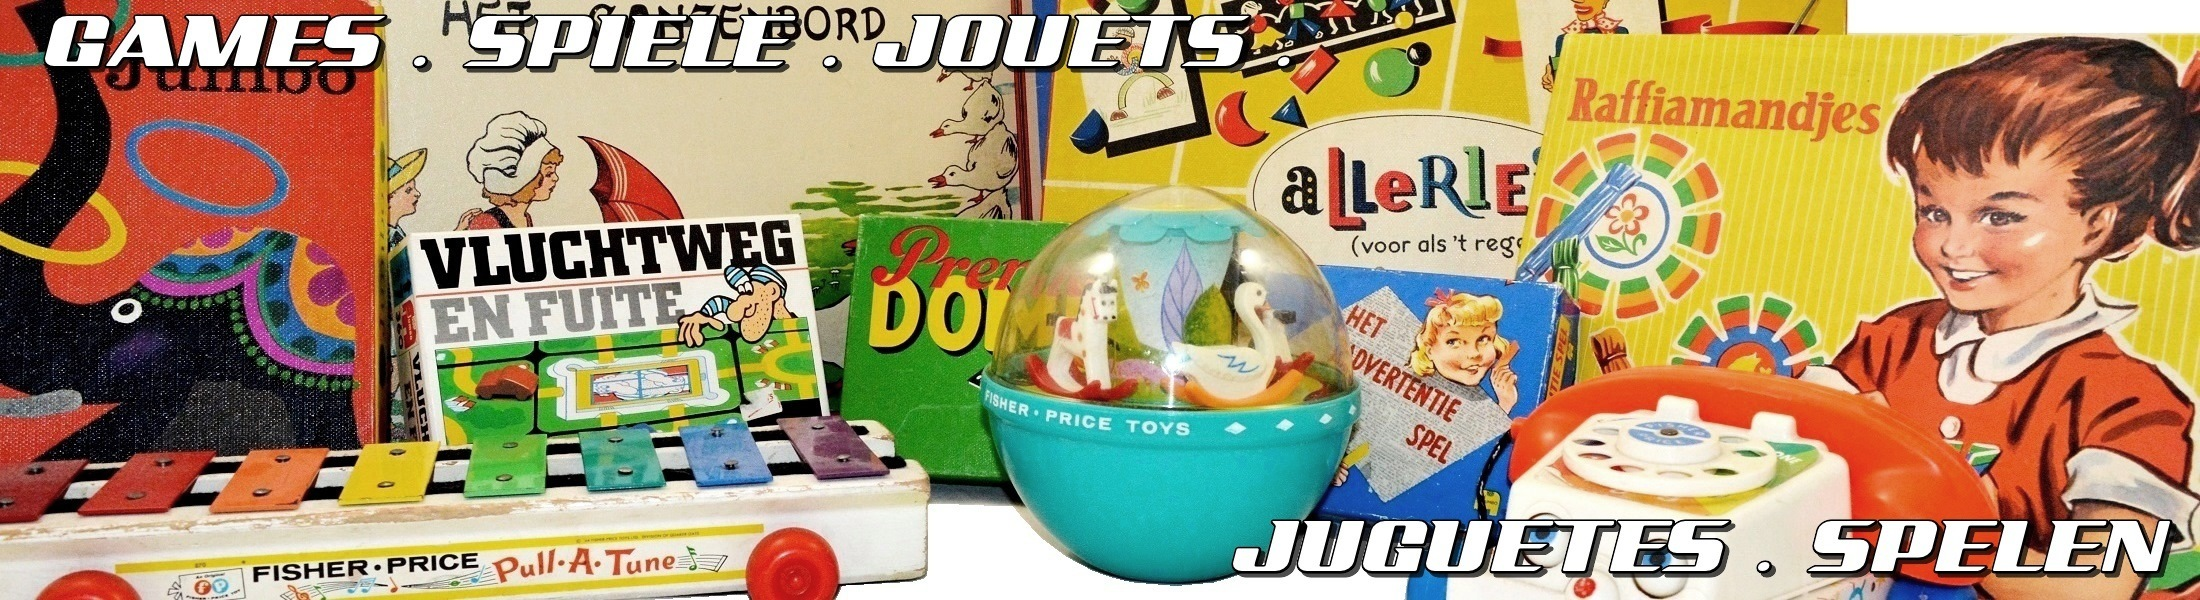 Games - Spiele - Jouets - Juguetes - Spelen